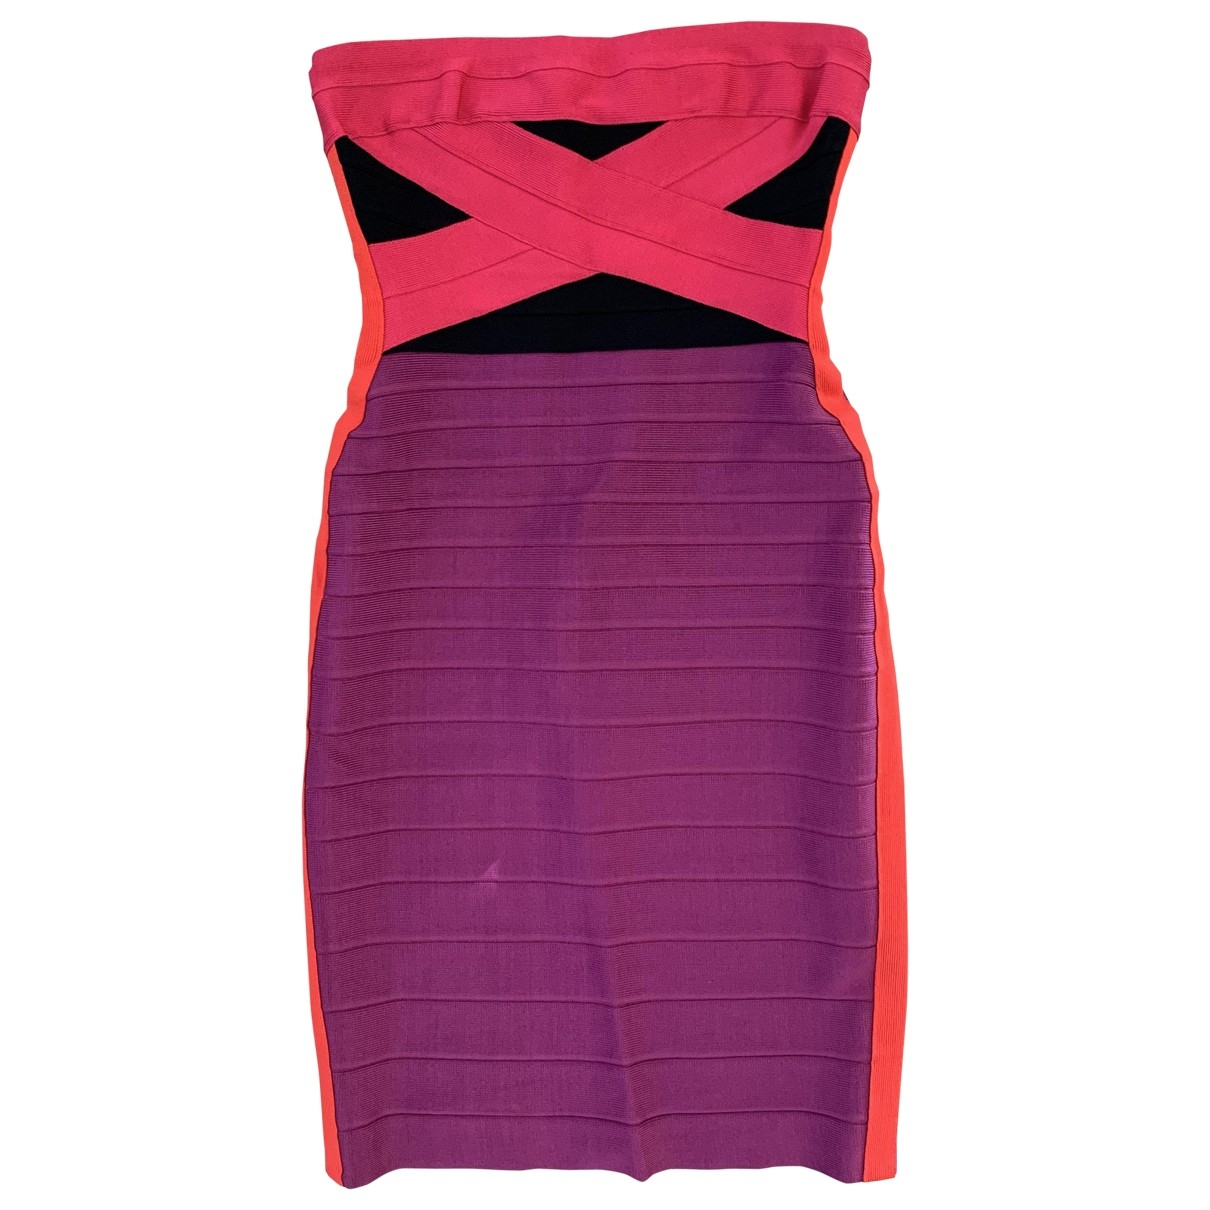 Herve Leger \N Multicolour dress for Women XS International